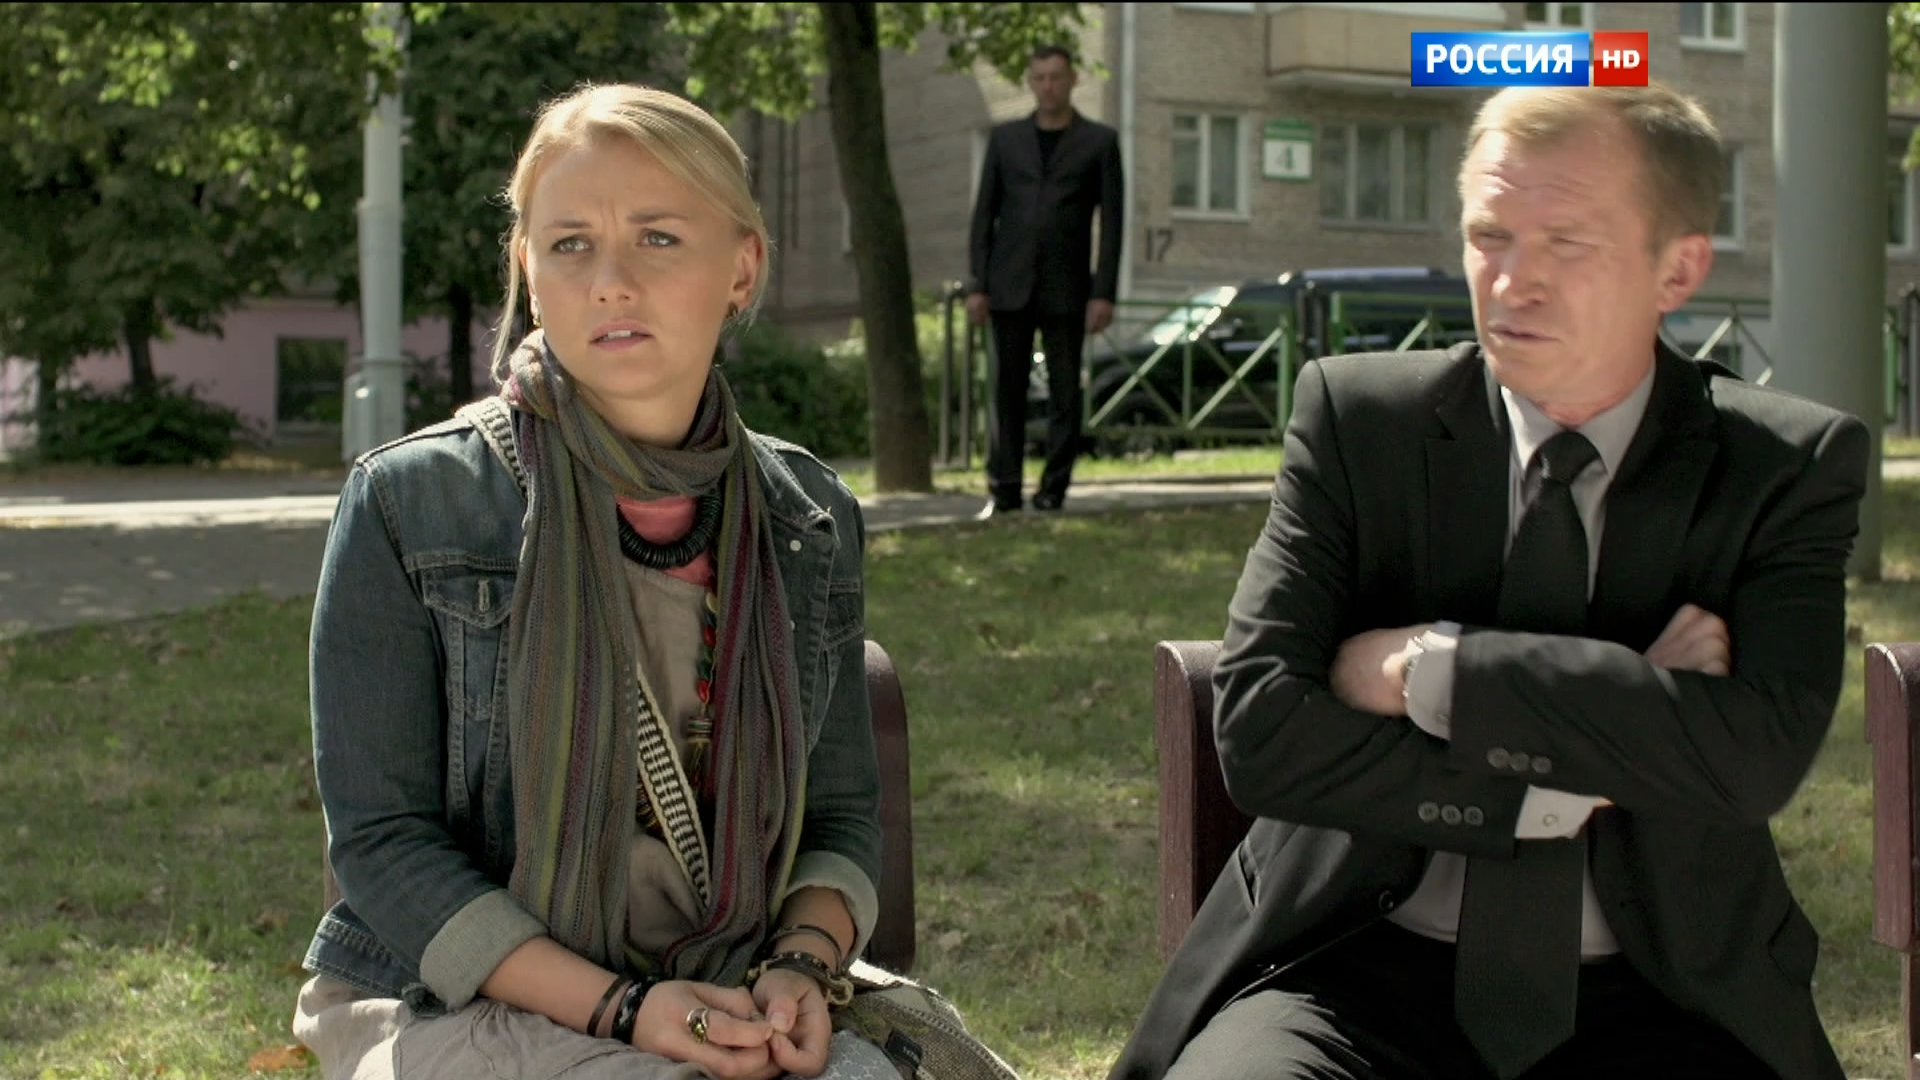 Чужое лицо 2015 HDTV 1080i.ts_snapshot_00.10.25_[2016.01.17_13.20.04].png